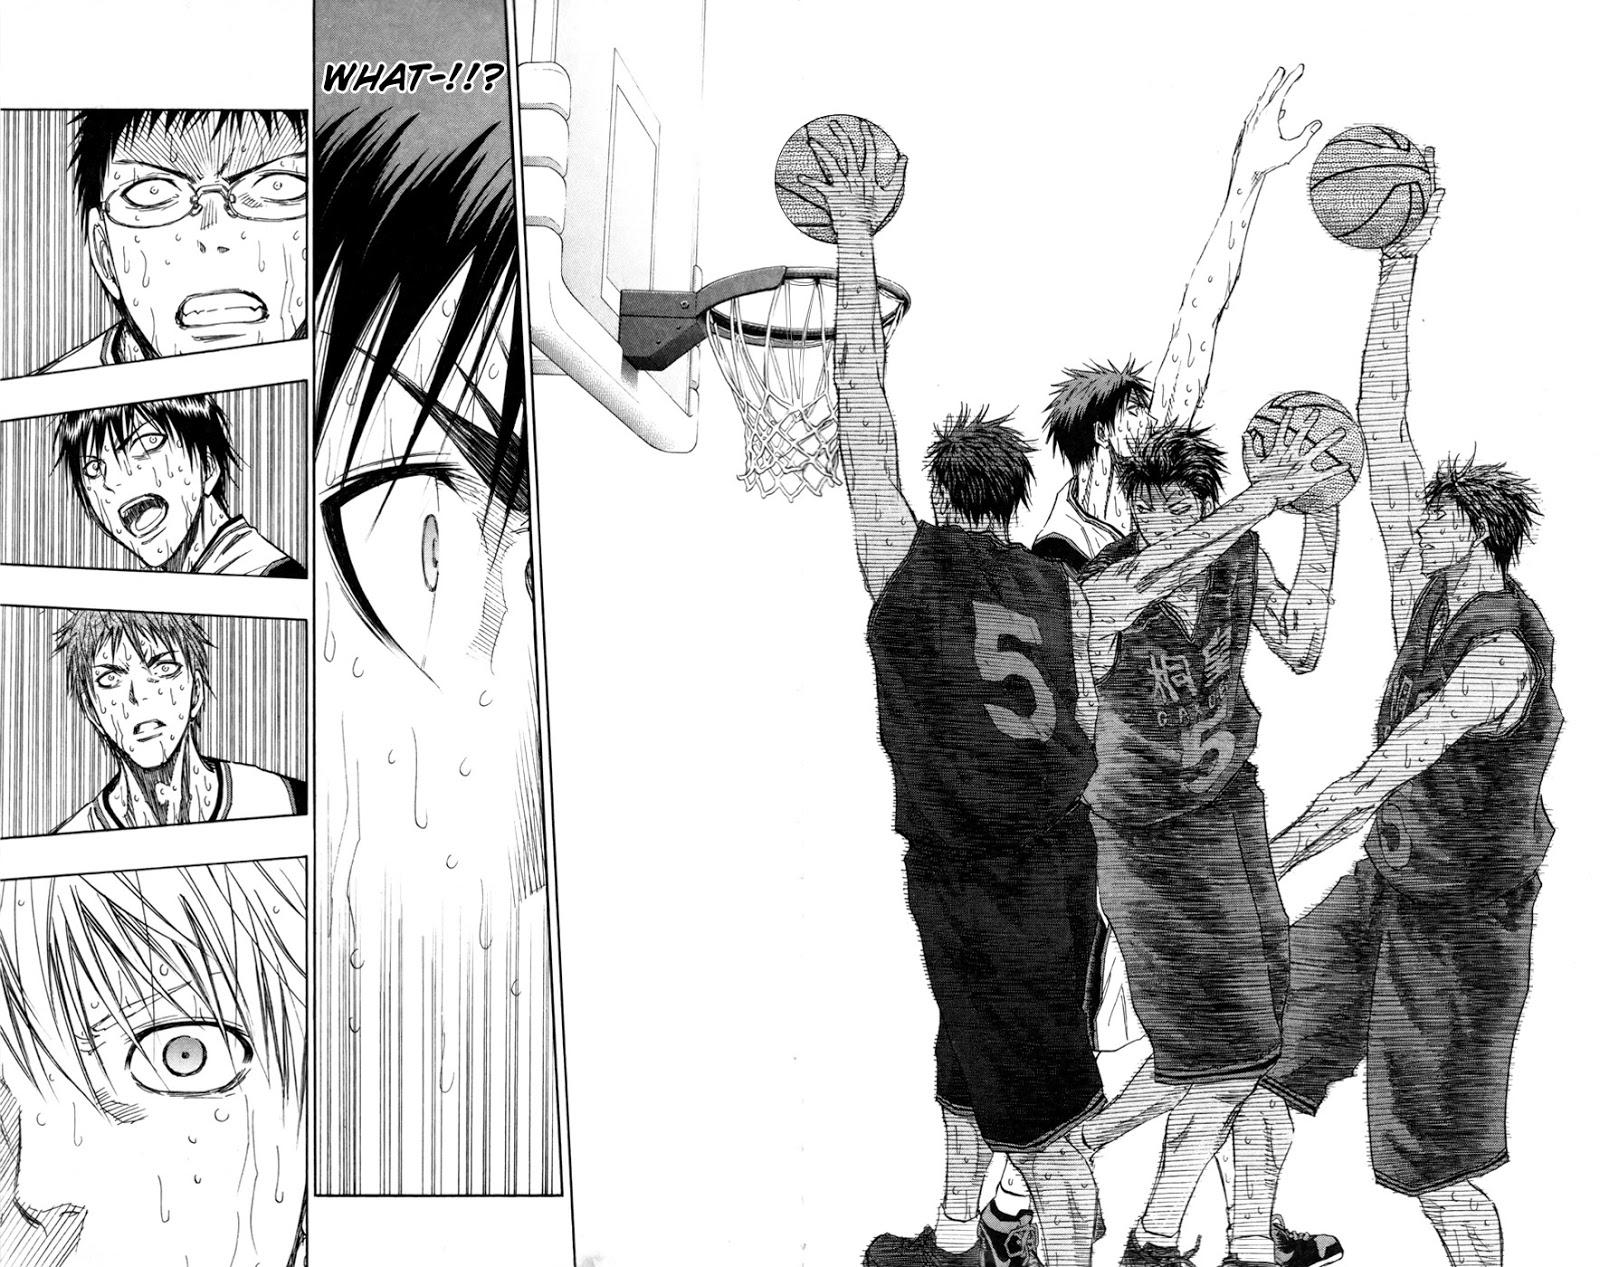 Kuroko no Basket Manga Chapter 127 - Image 14-15